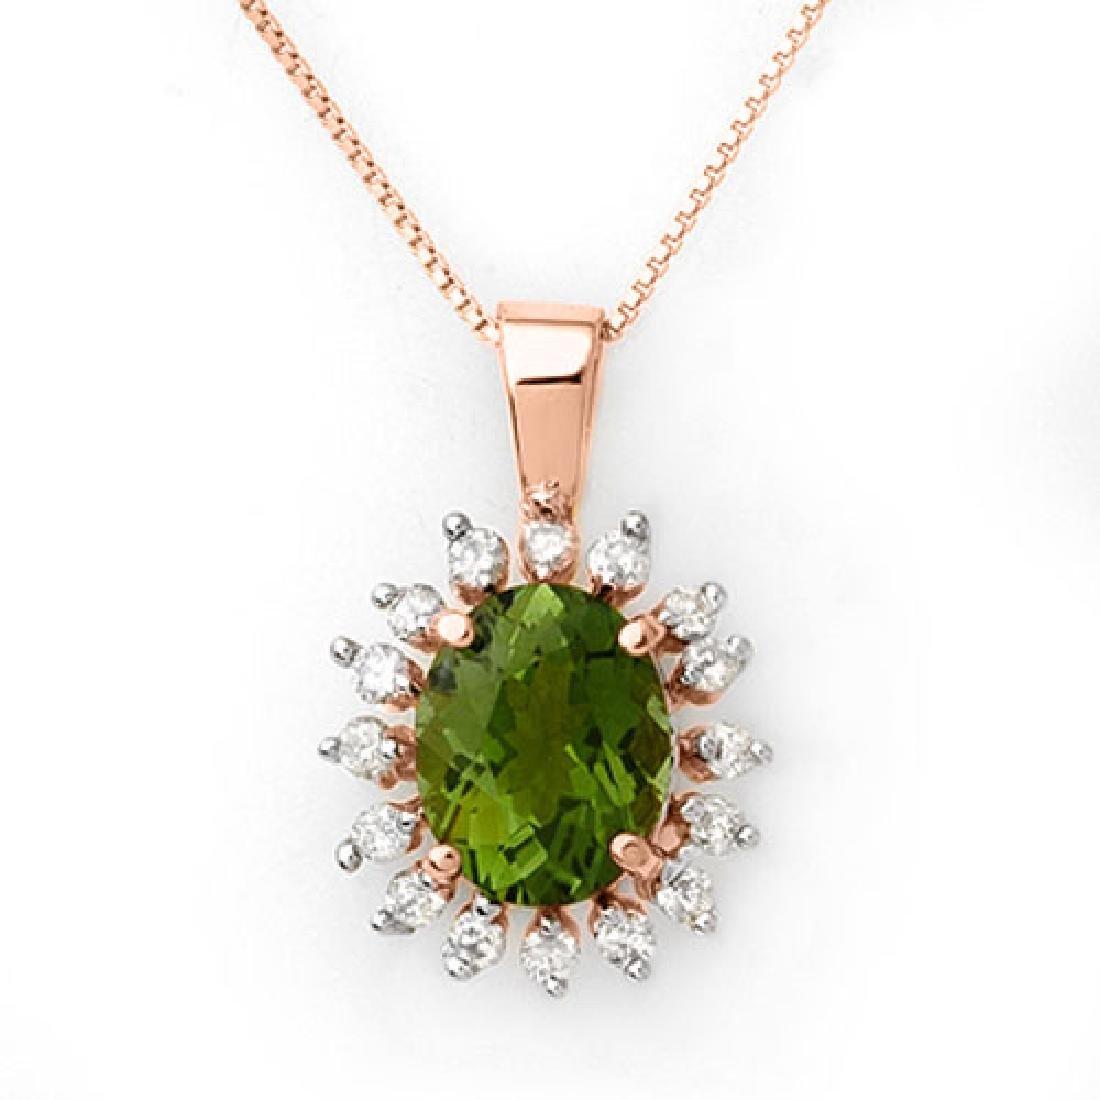 3.55 CTW Green Tourmaline & Diamond Necklace 14K Rose